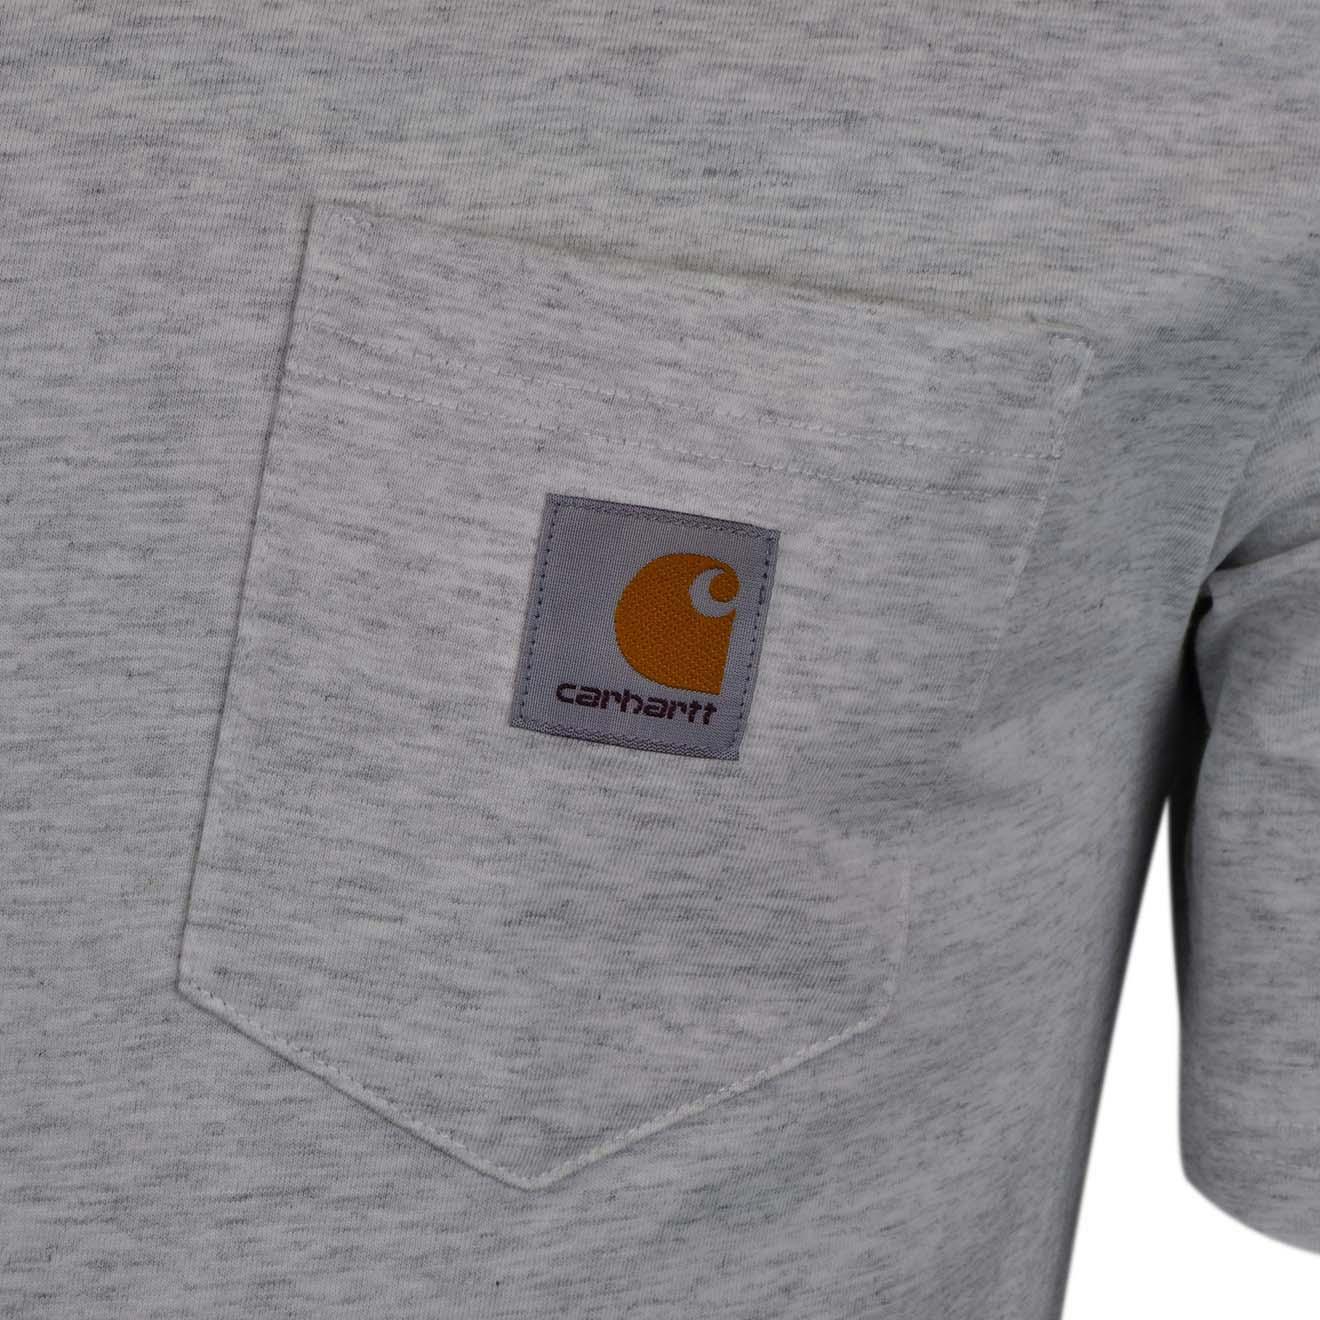 Carhartt Pocket T Shirt Ash Heather